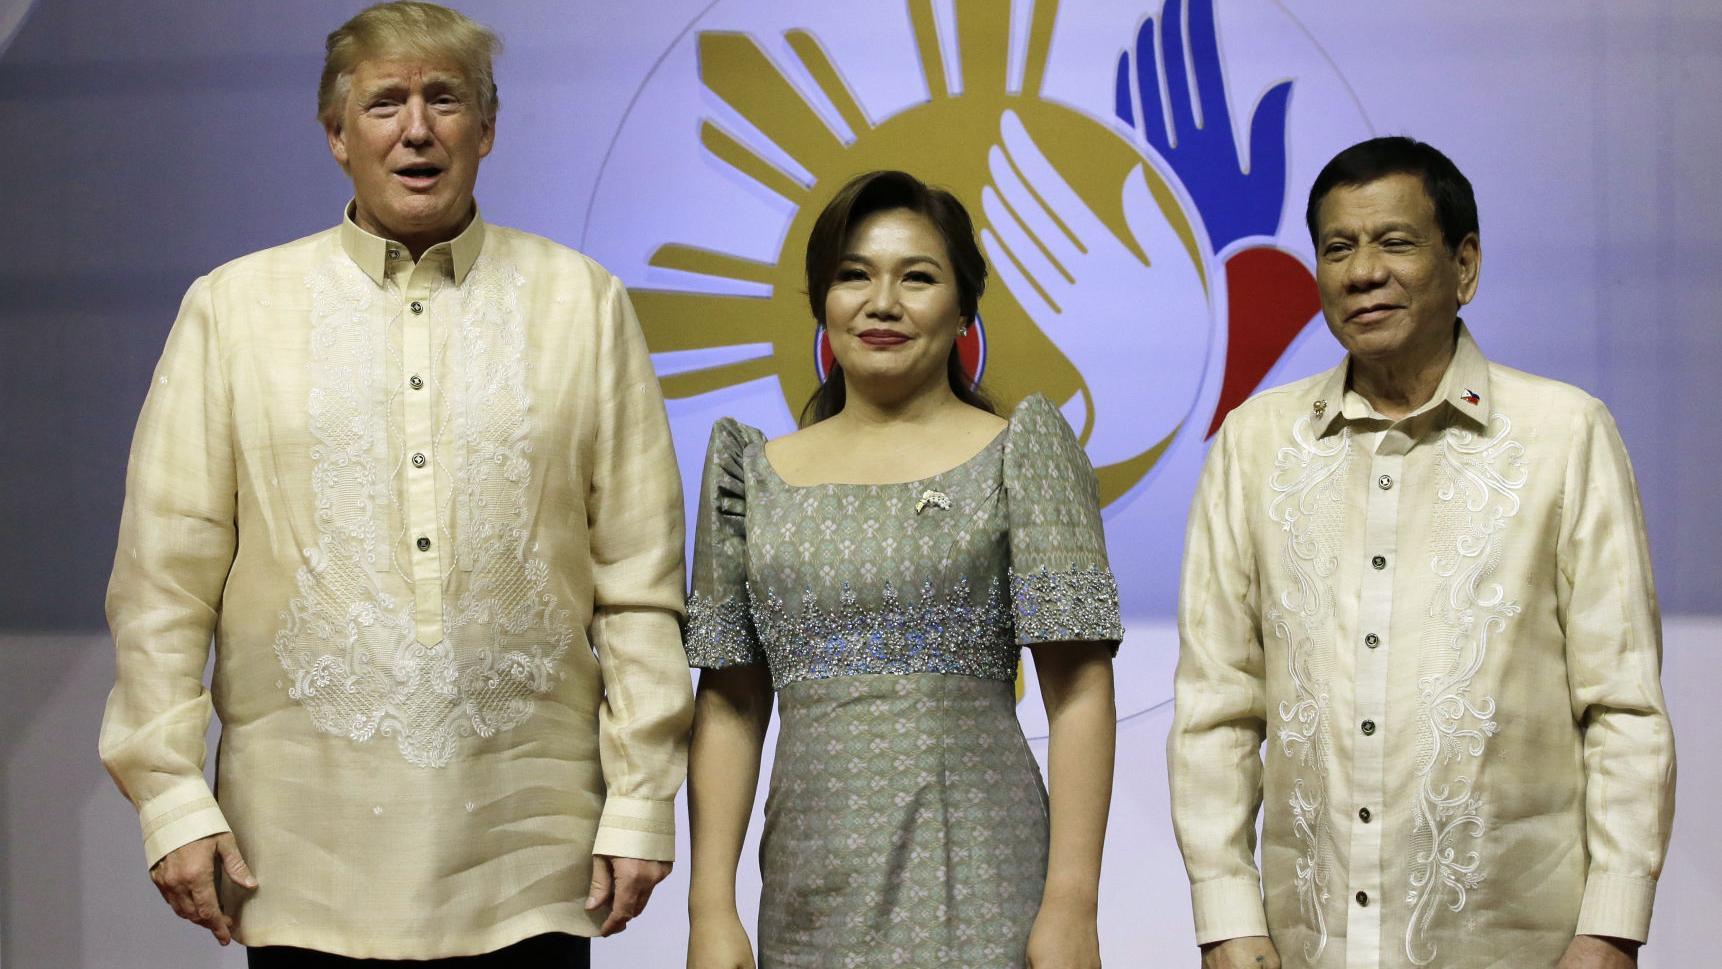 Scenes from Trump's 'tremendously successful' Asia trip